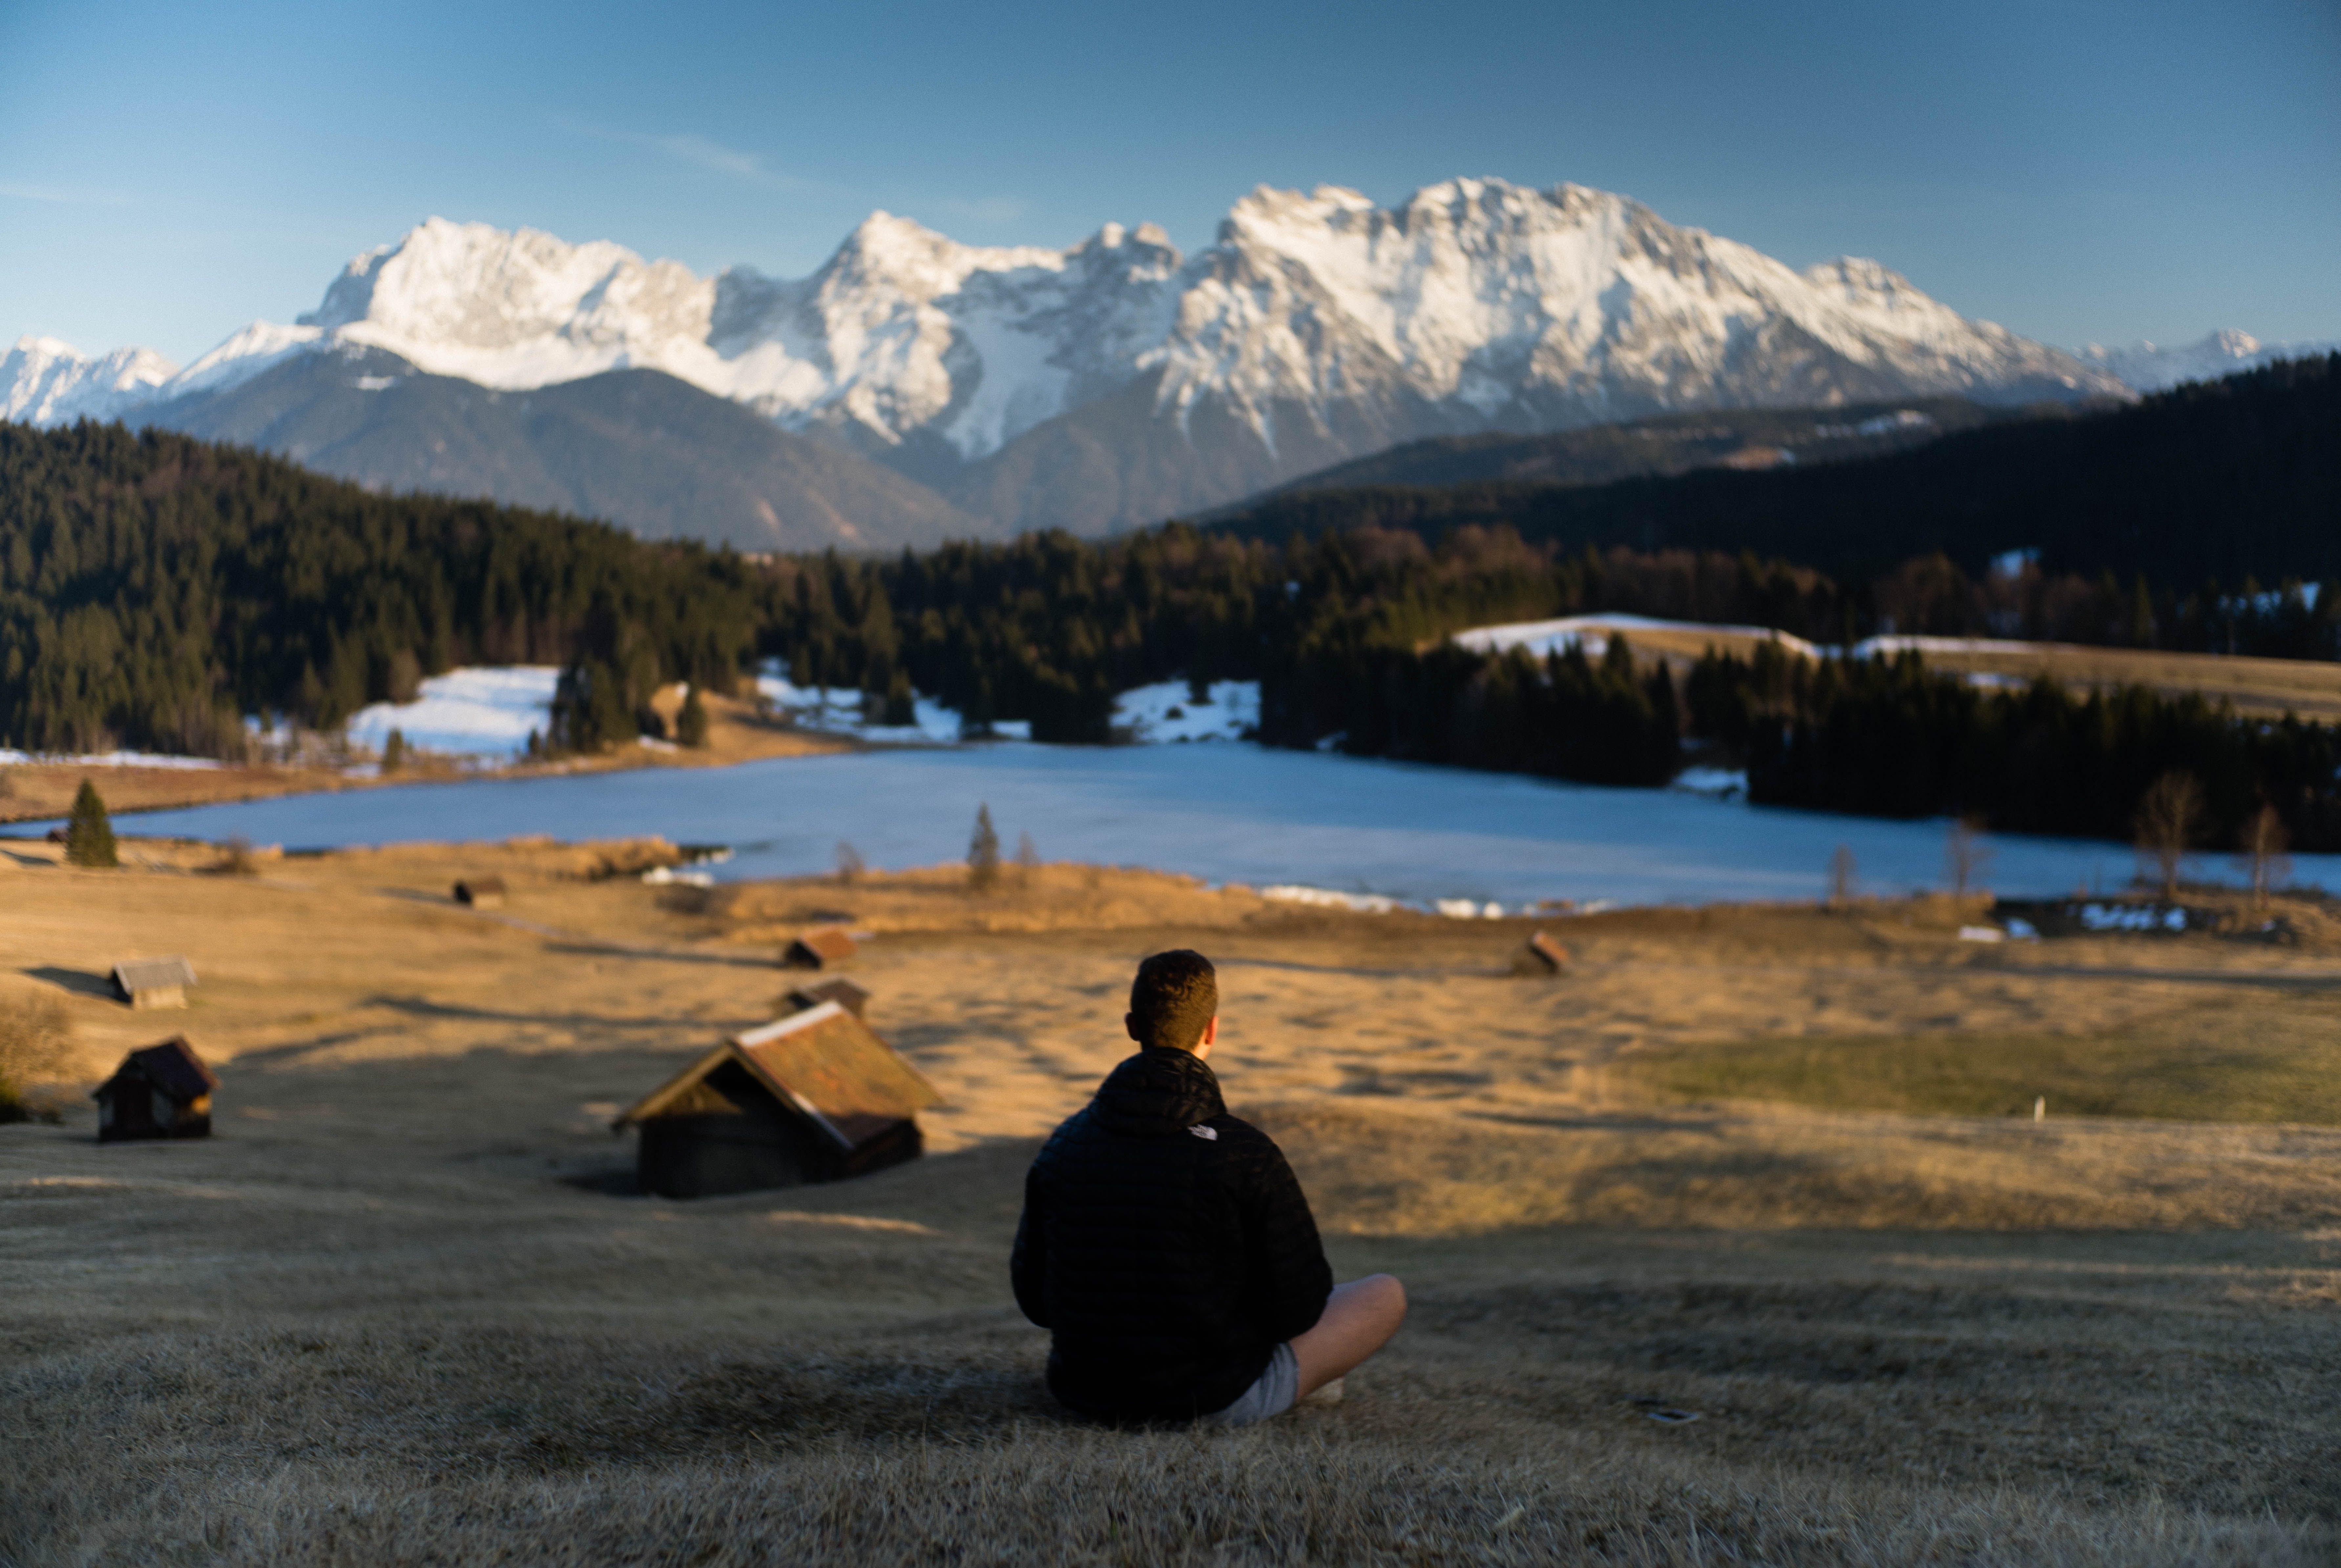 Man Sitting on Green Grass Field